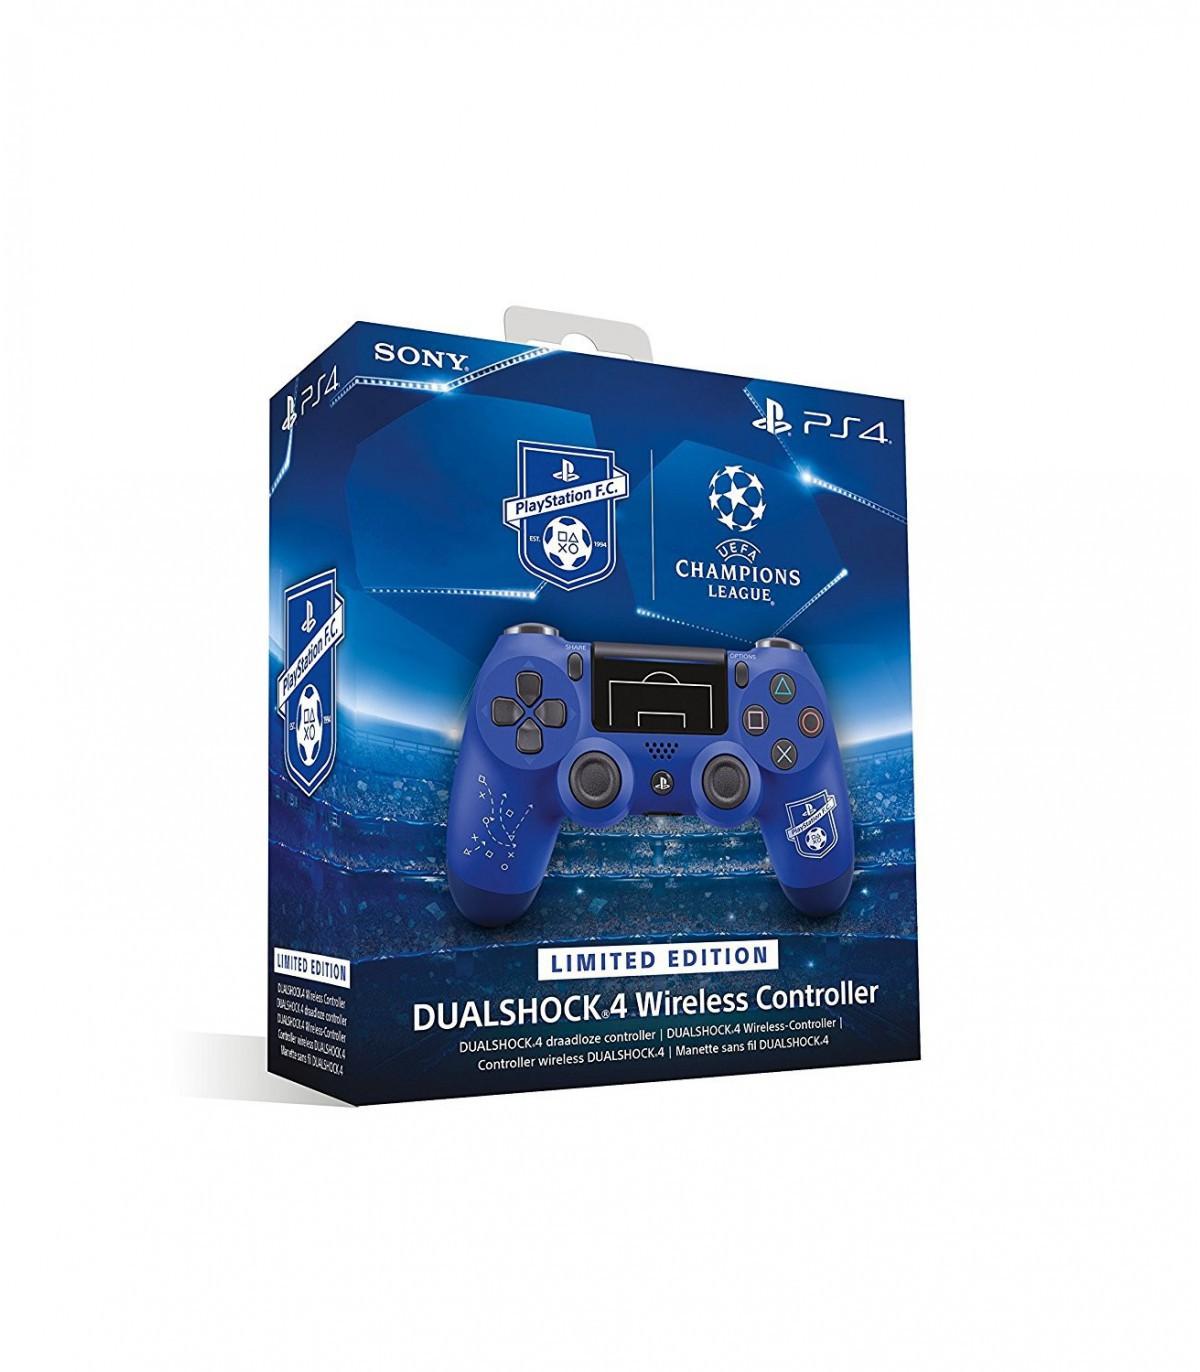 دسته بازی لیمیتد ادیشن DualShock 4 F.C. Football Club Limited Edition